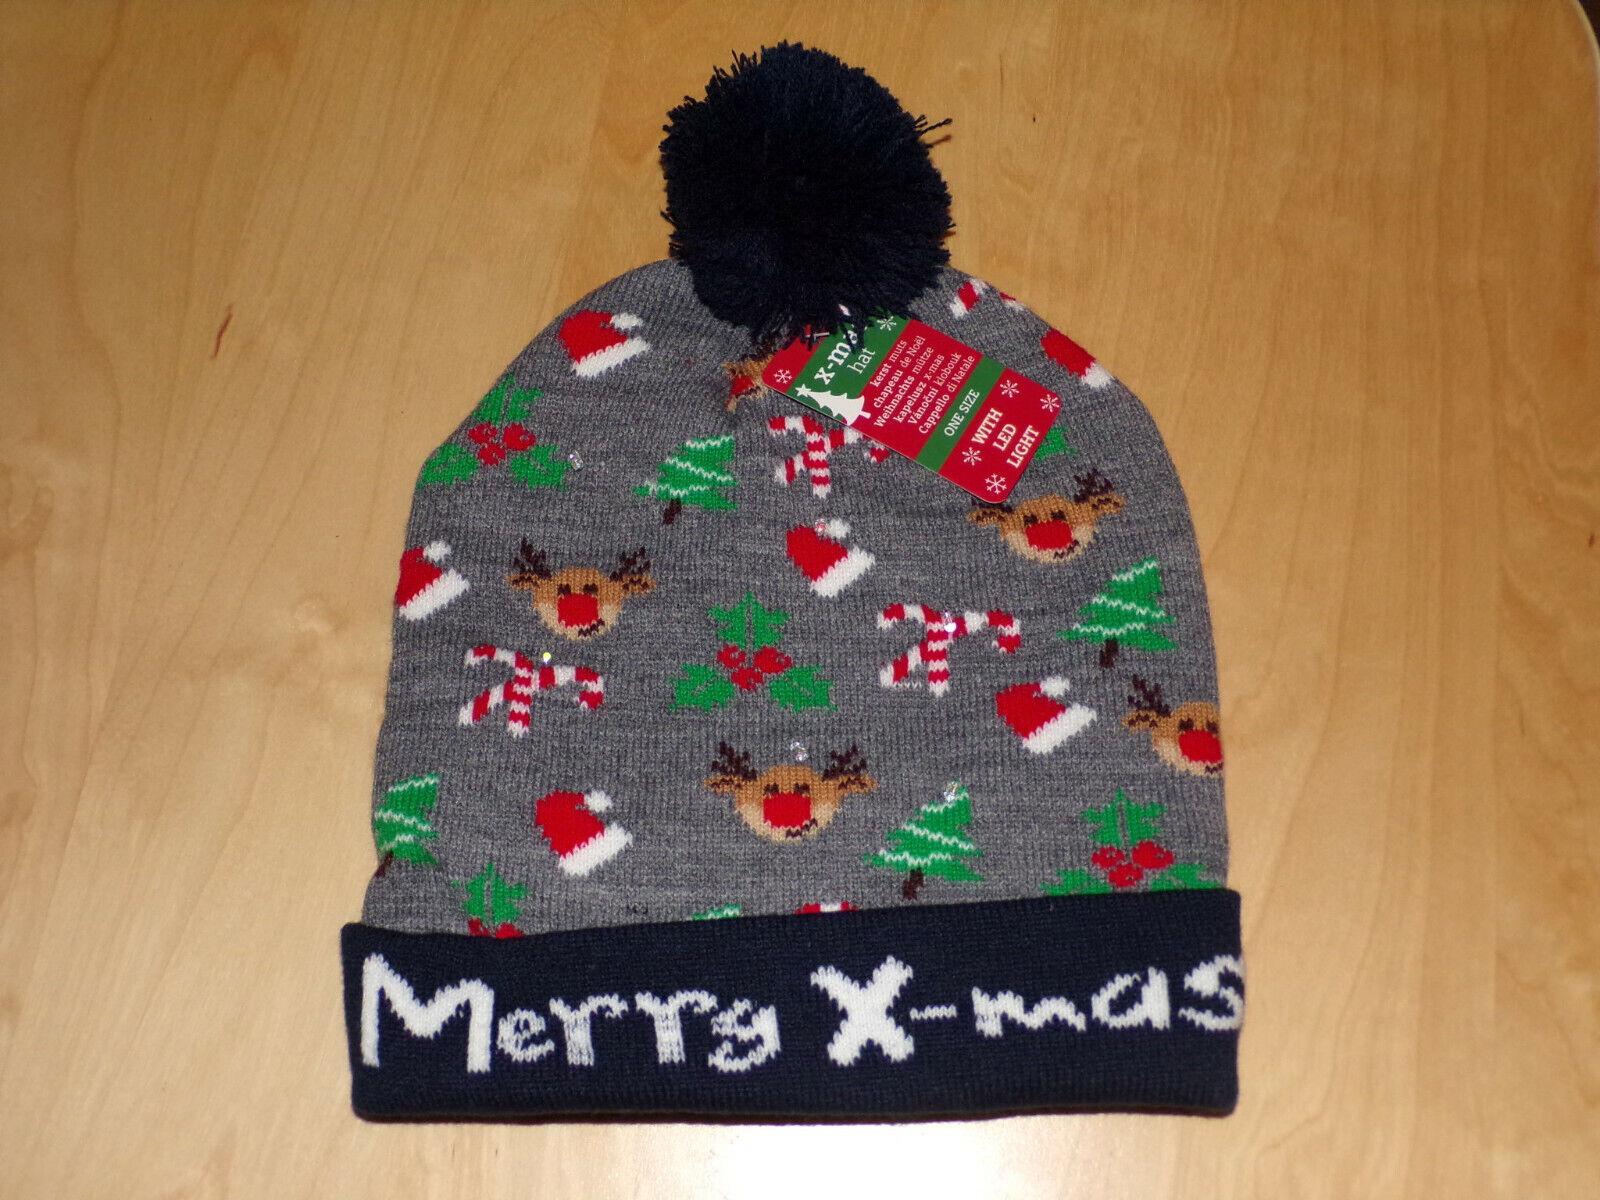 6 LED Christmas Winter Hat Grey Beanie Illuminated Merry Xmas Ladies Mens